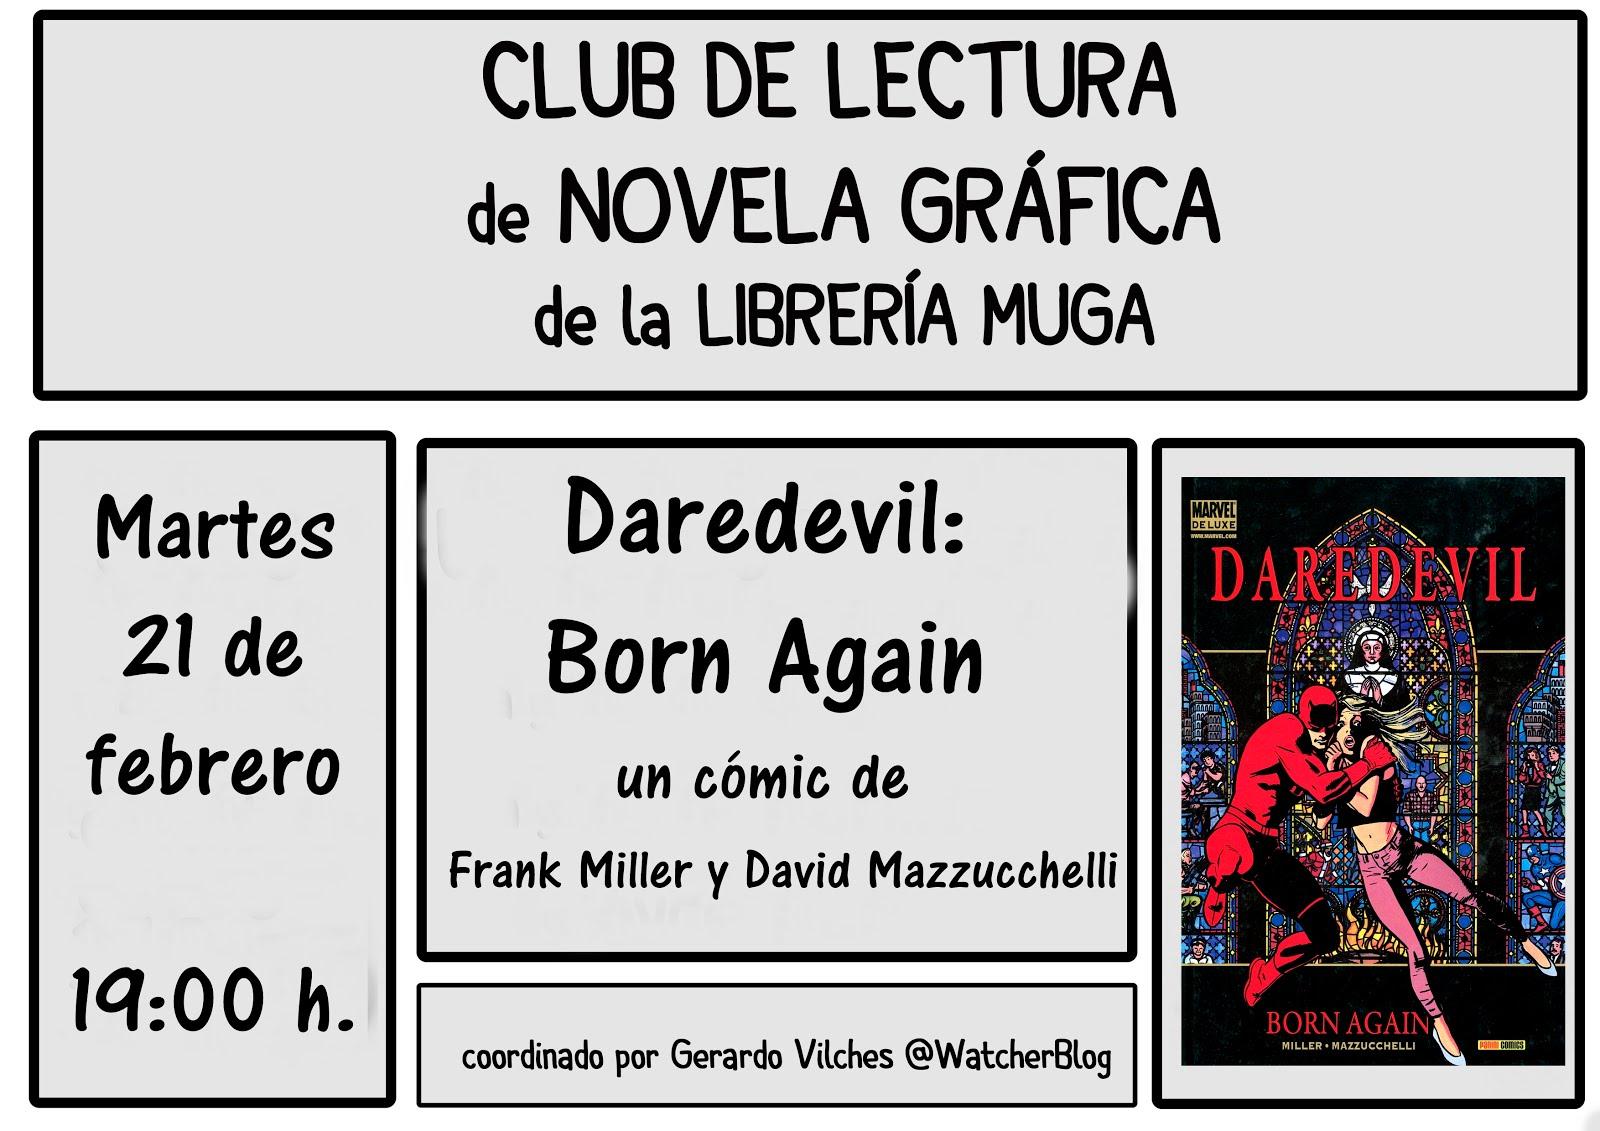 Club de lectura de novela gráfica